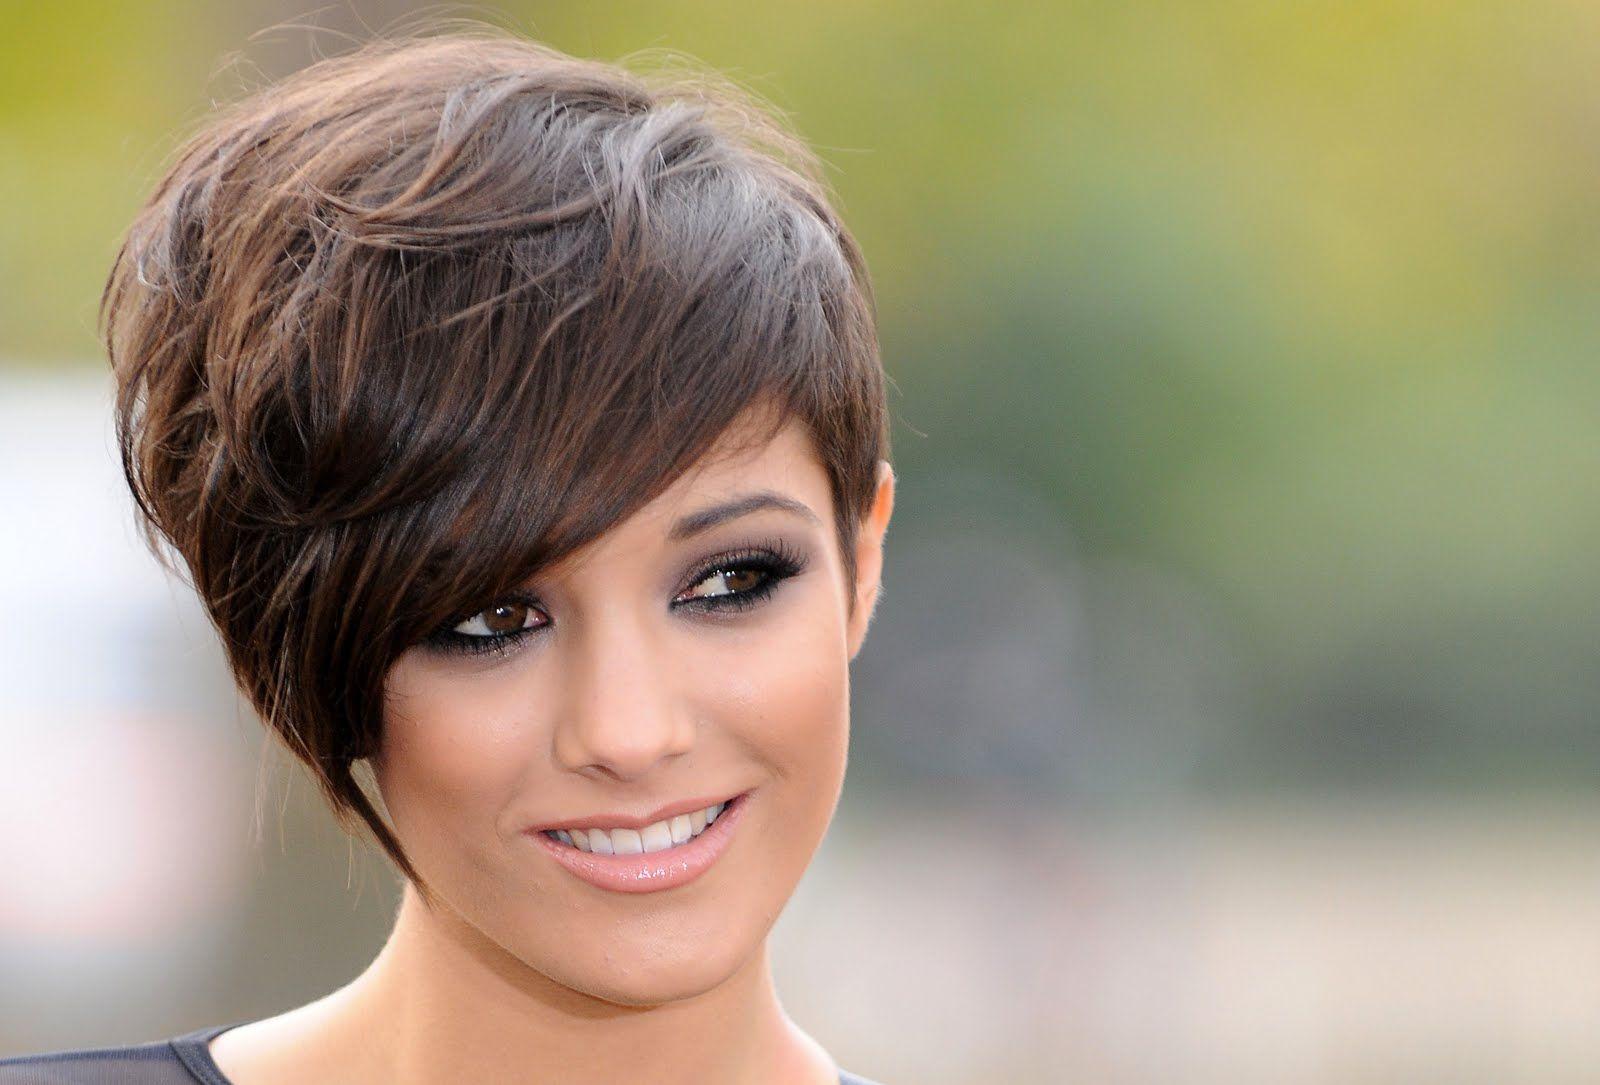 Frankie sandford hairstyles pinterest frankie sandford hair